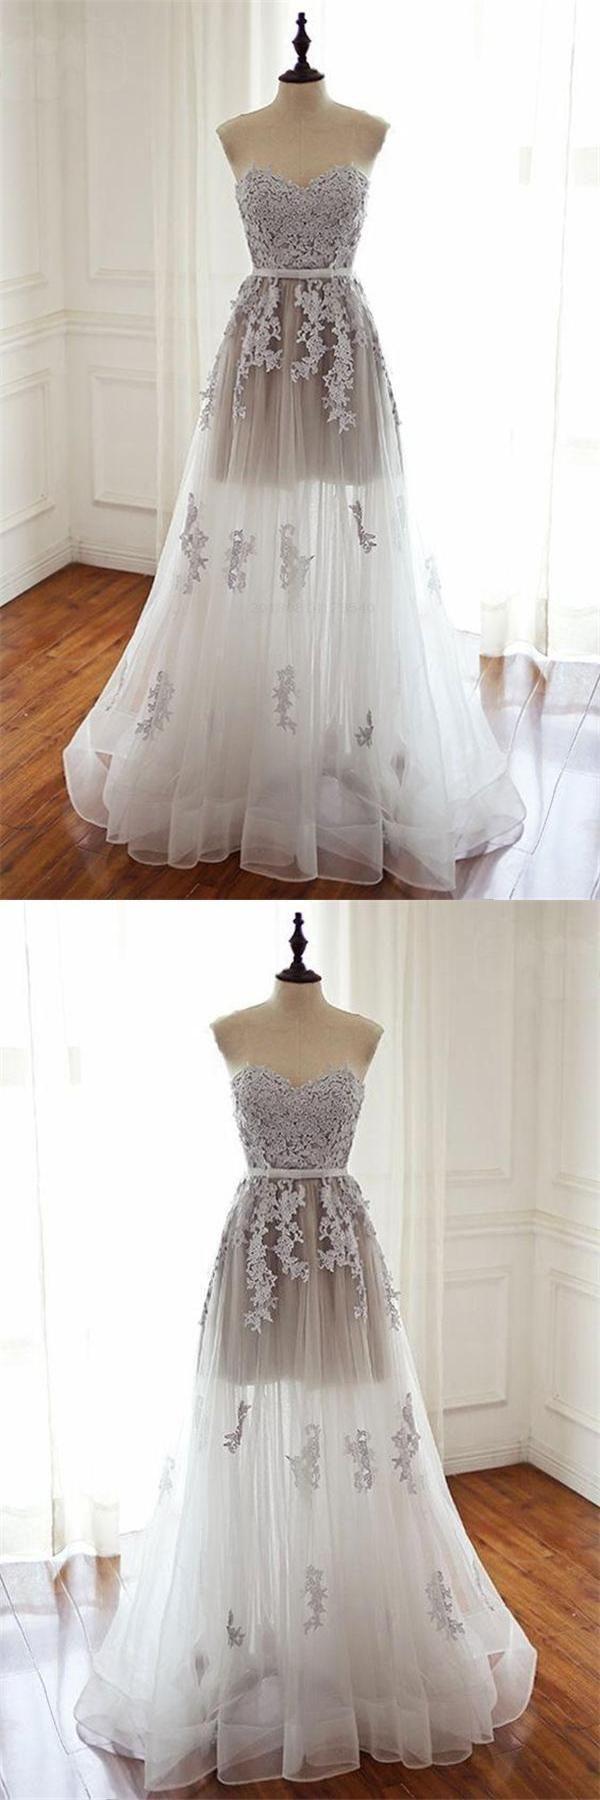 Prom dresses lace lace white prom dresses white wedding dresses